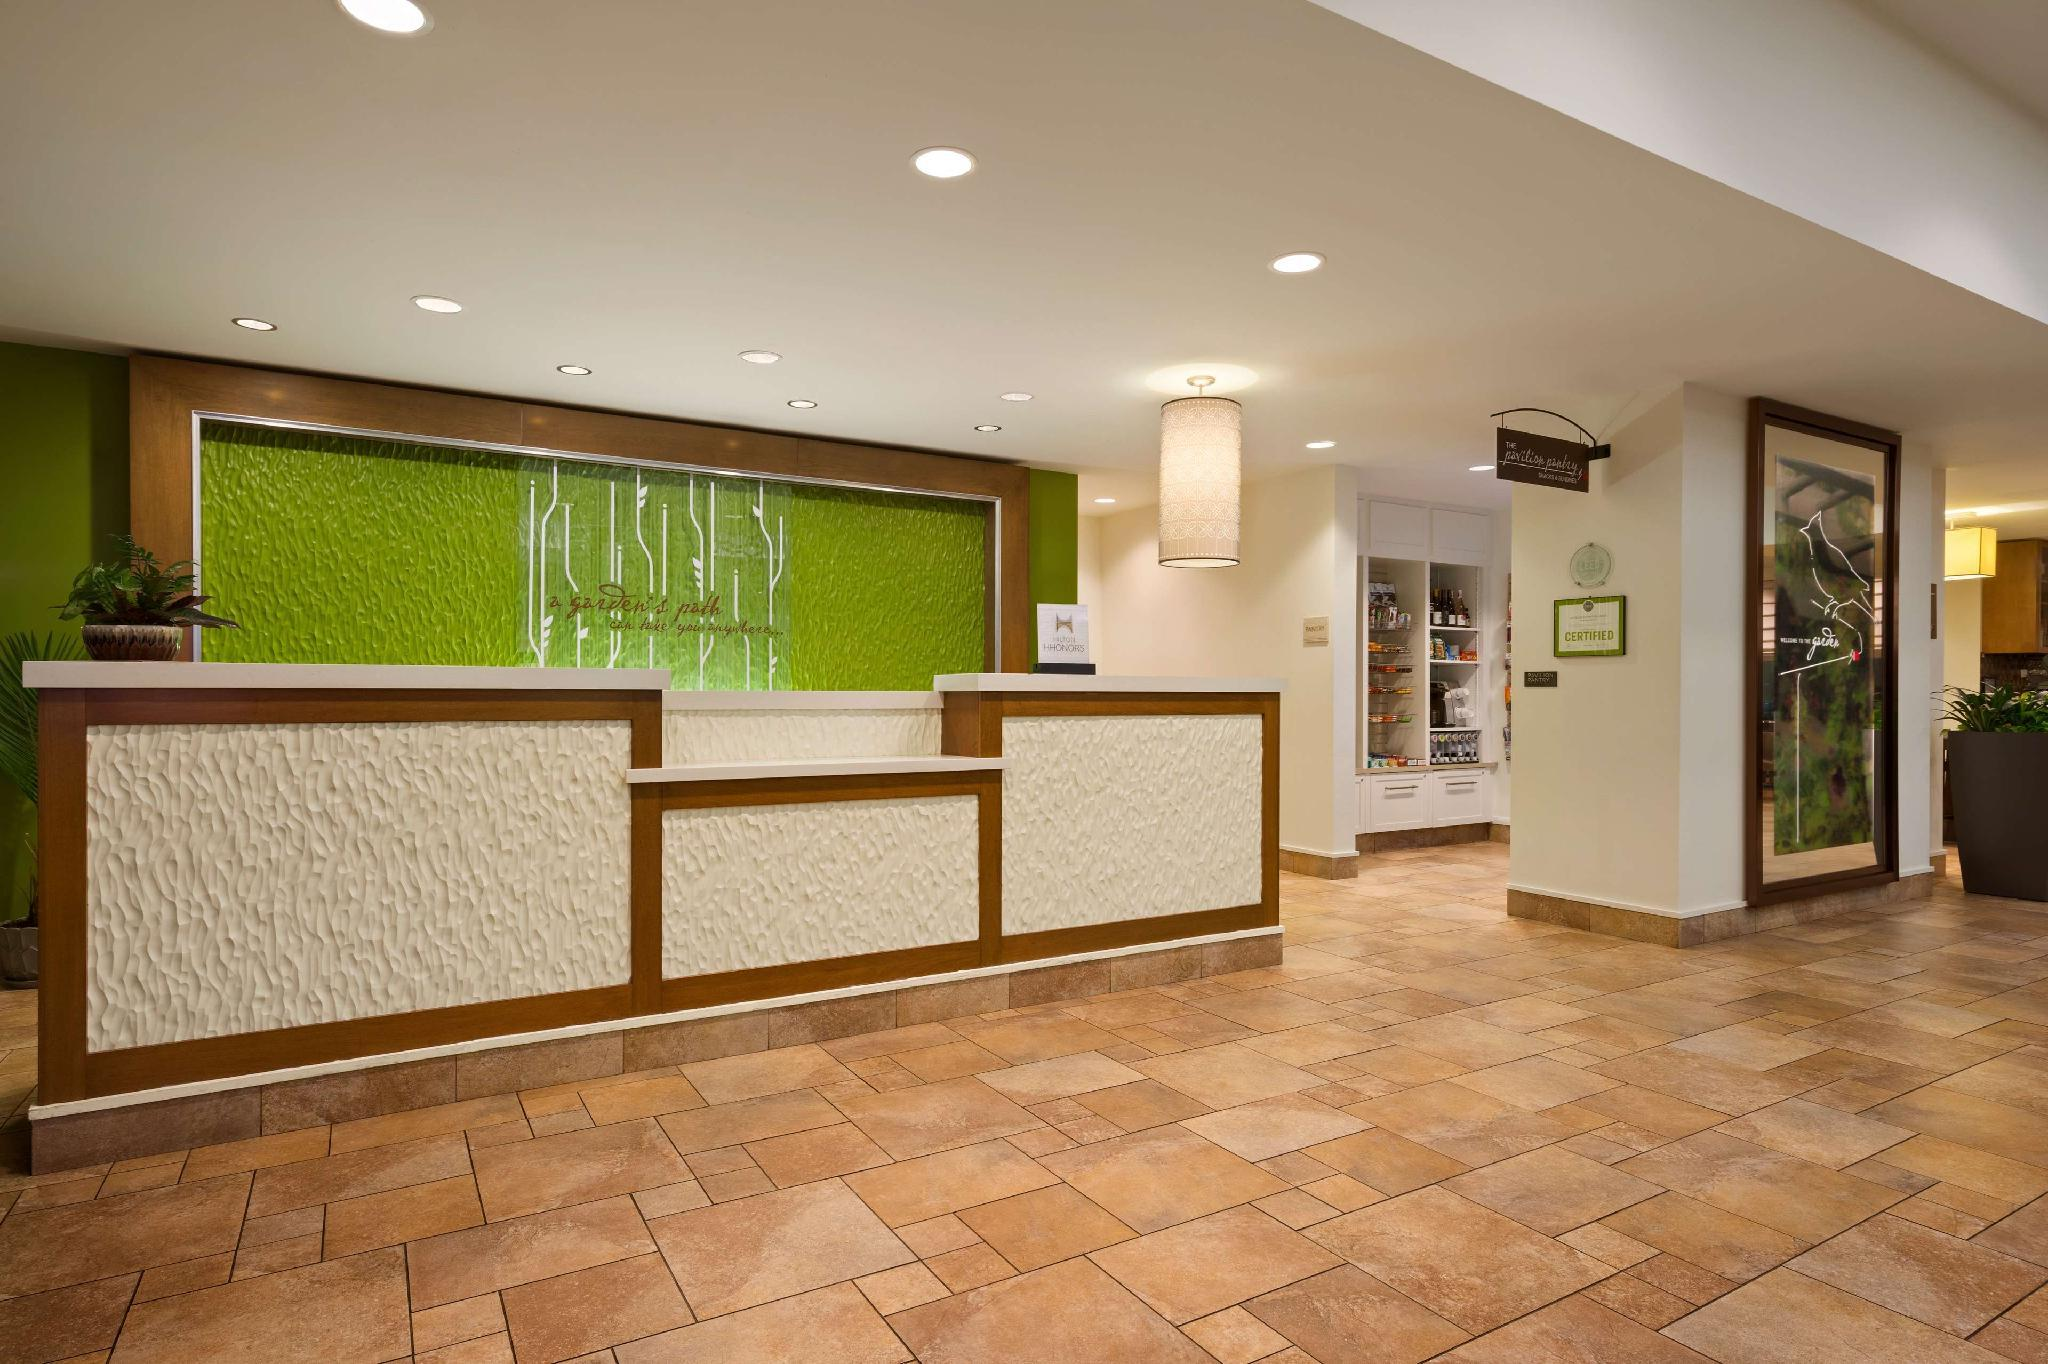 Hilton Garden Inn Stony Brook